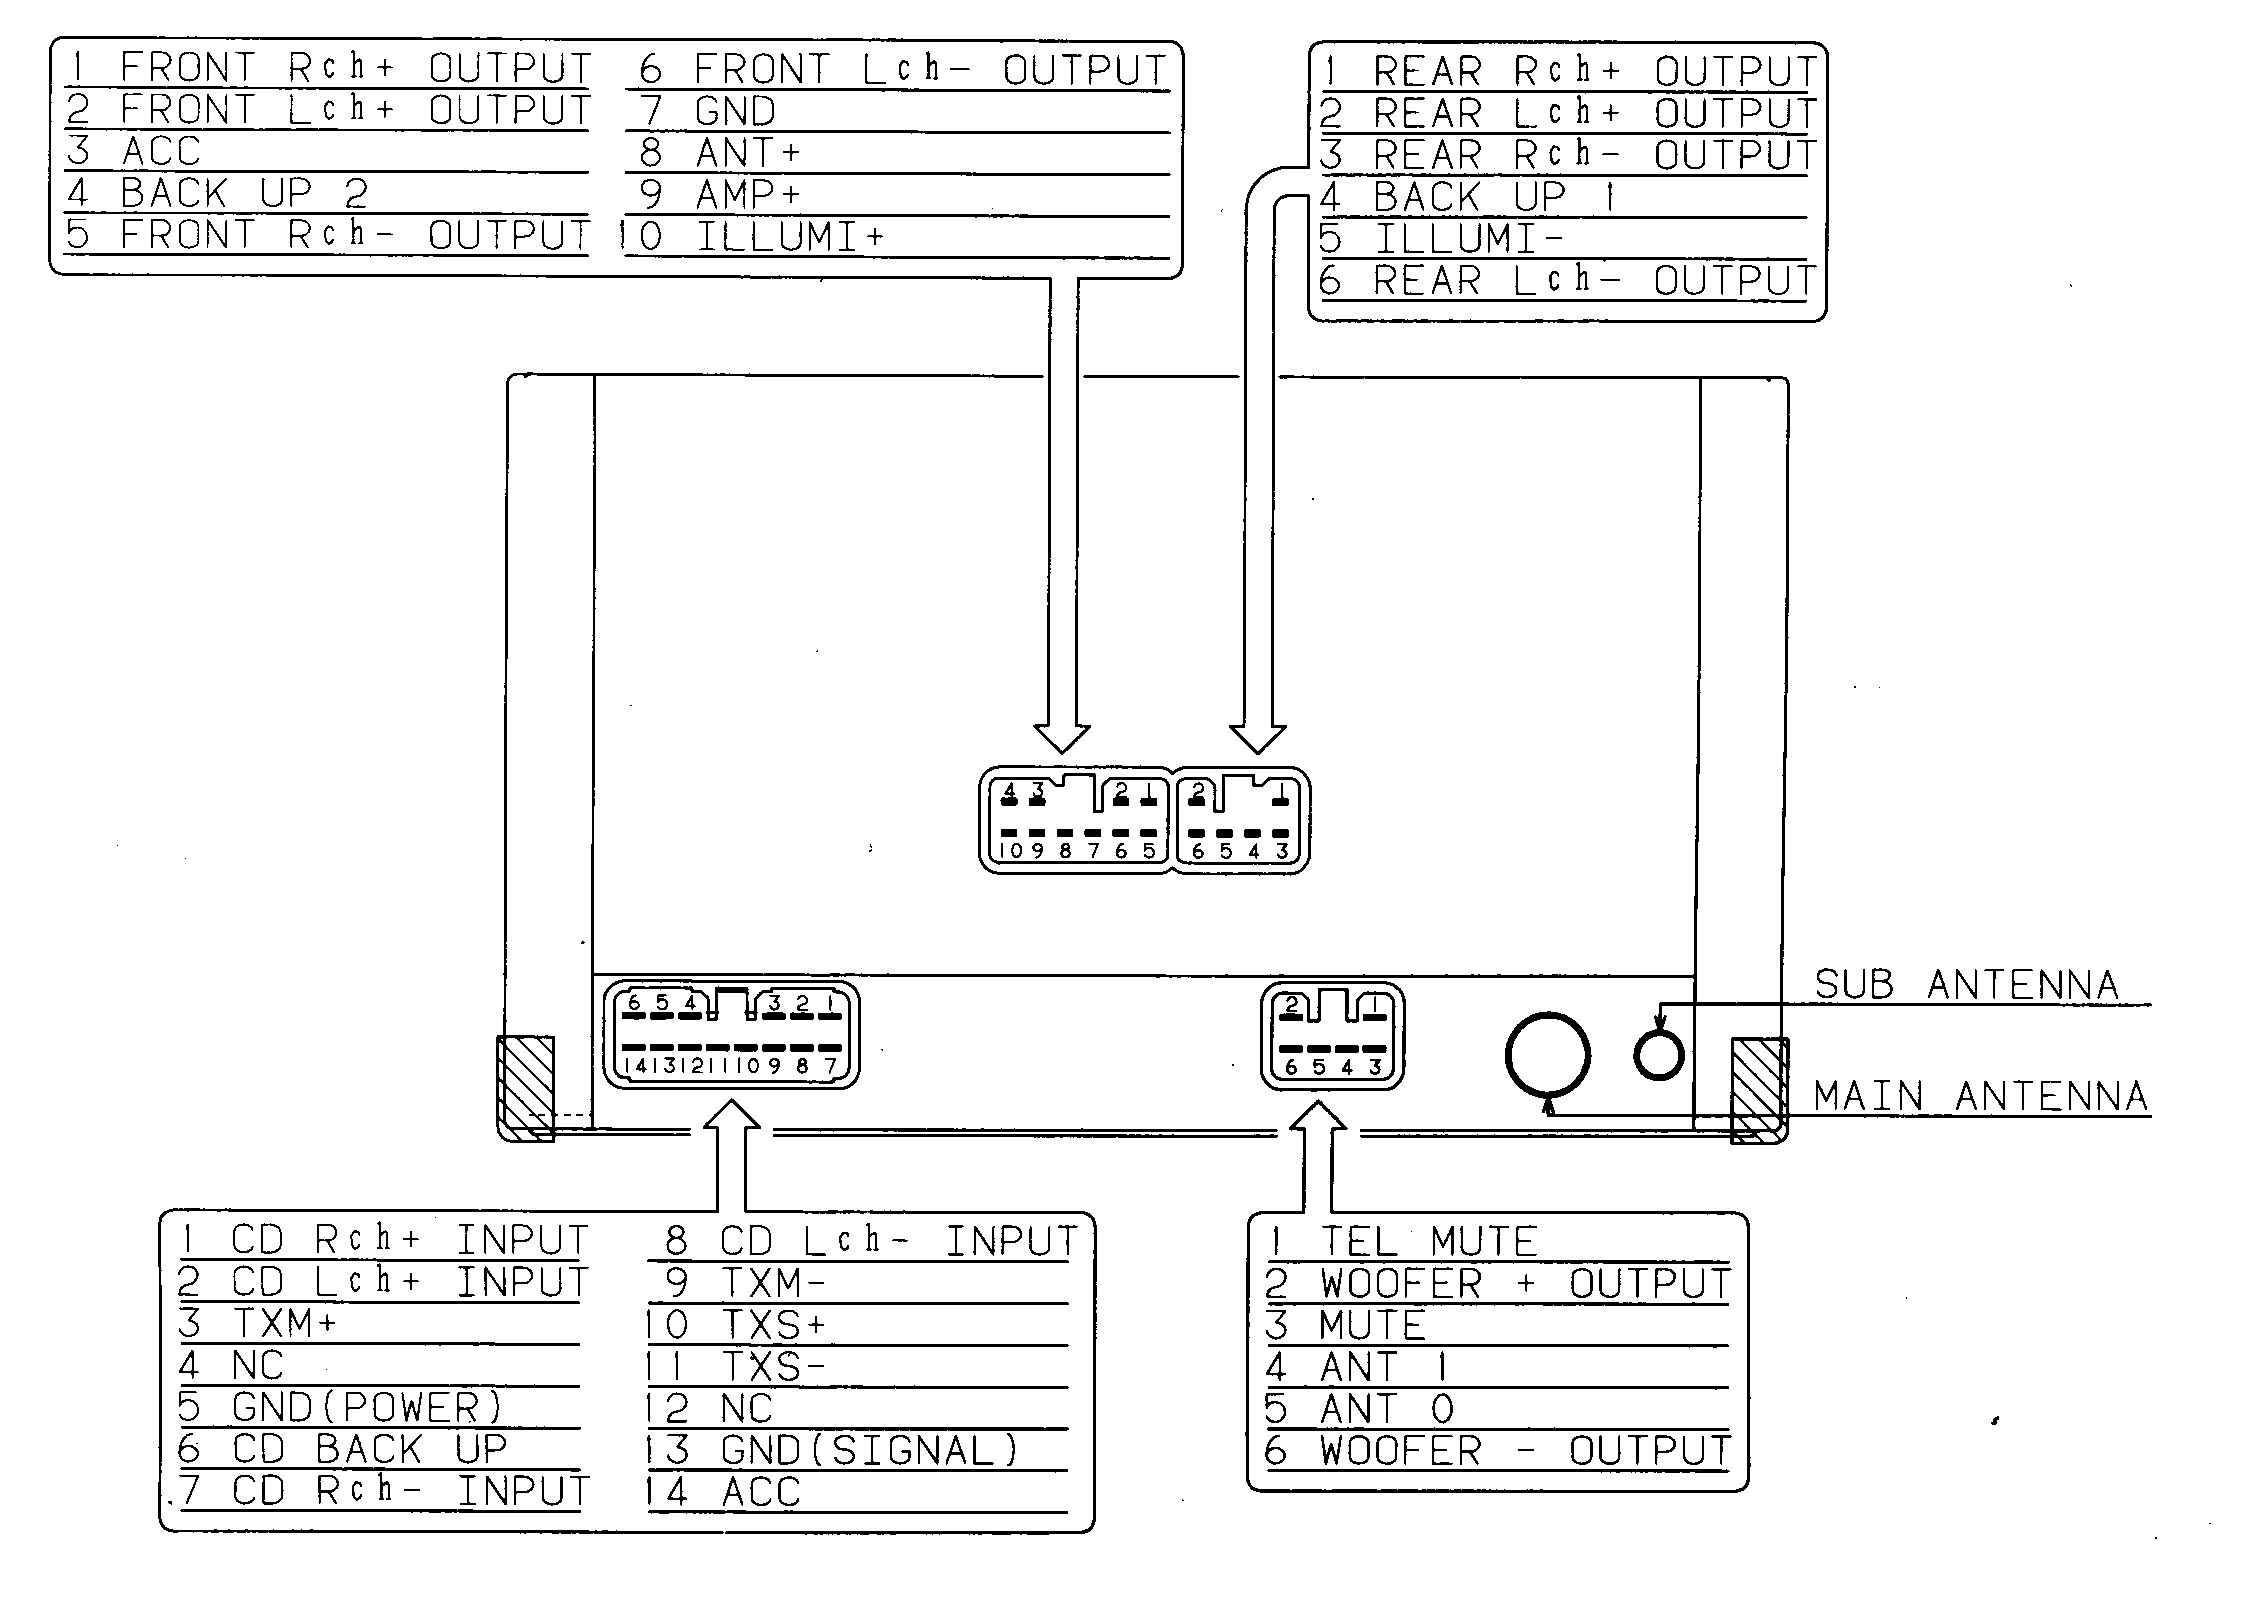 alpine car stereo wiring diagram 2006 sterling truck diagrams best of